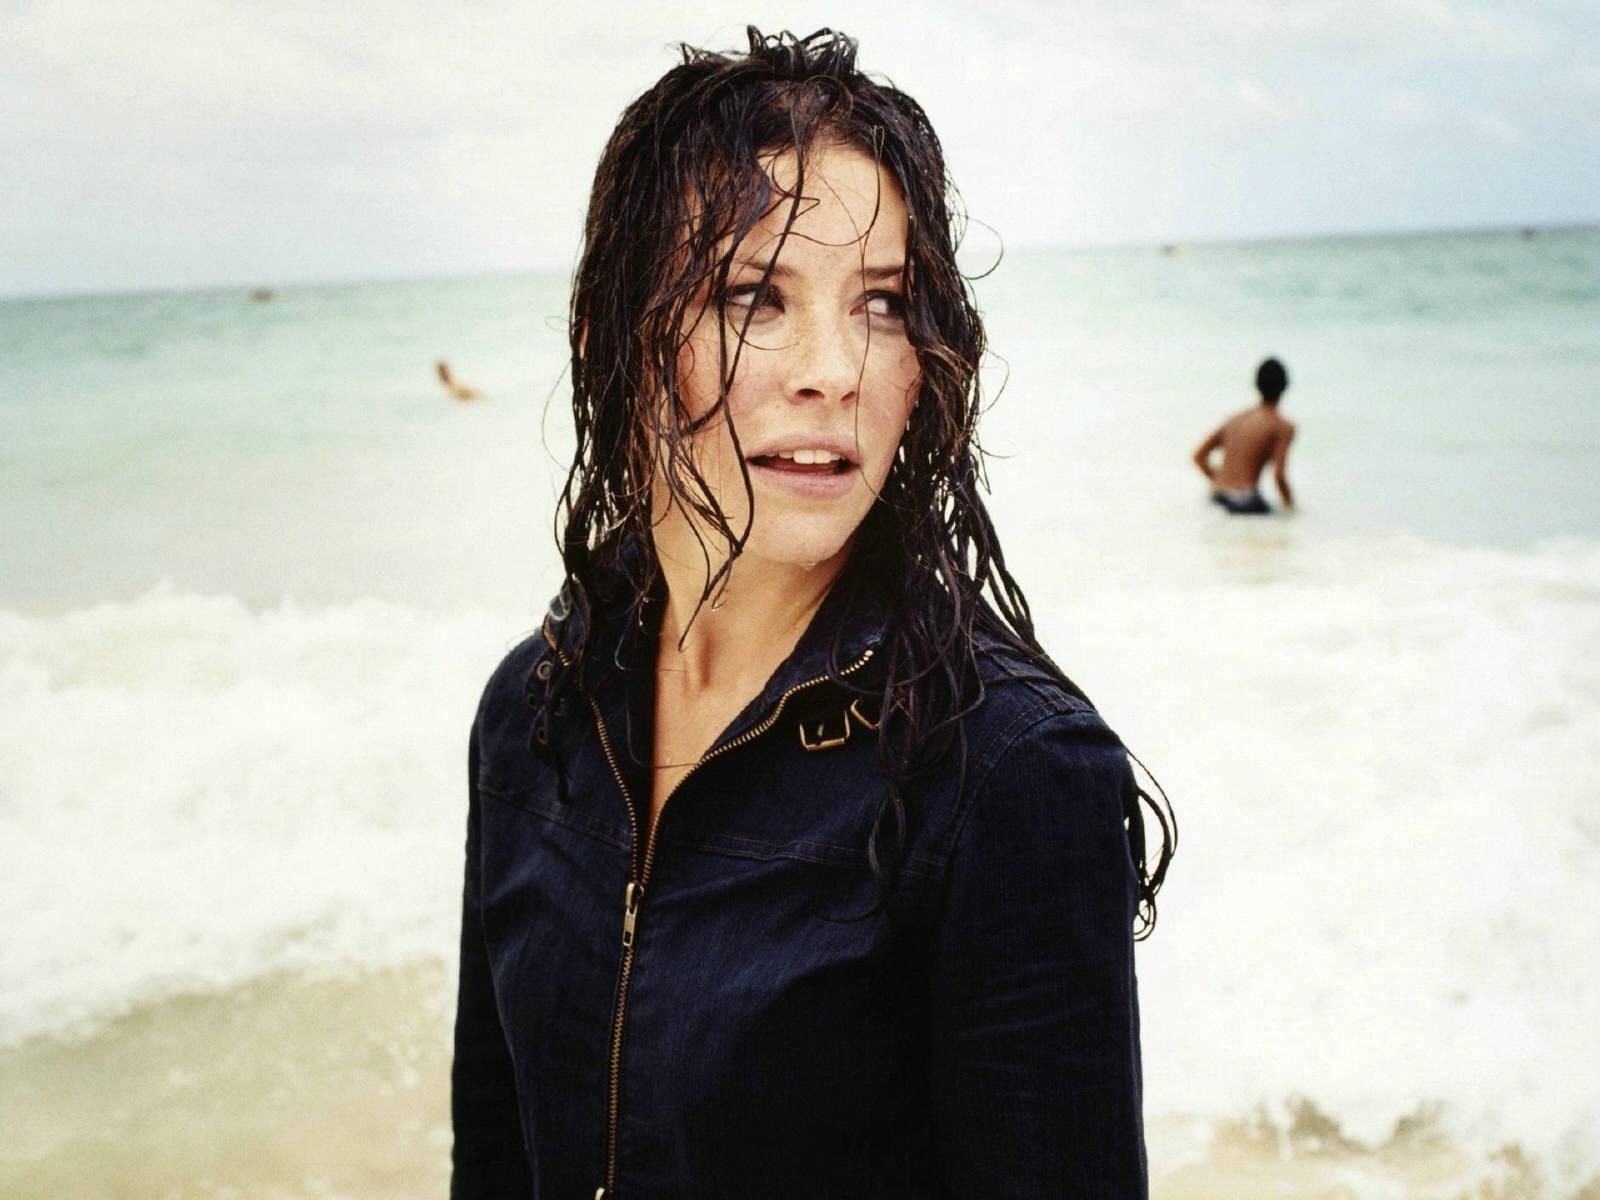 Wallpaper dell'attrice Evangeline Lilly